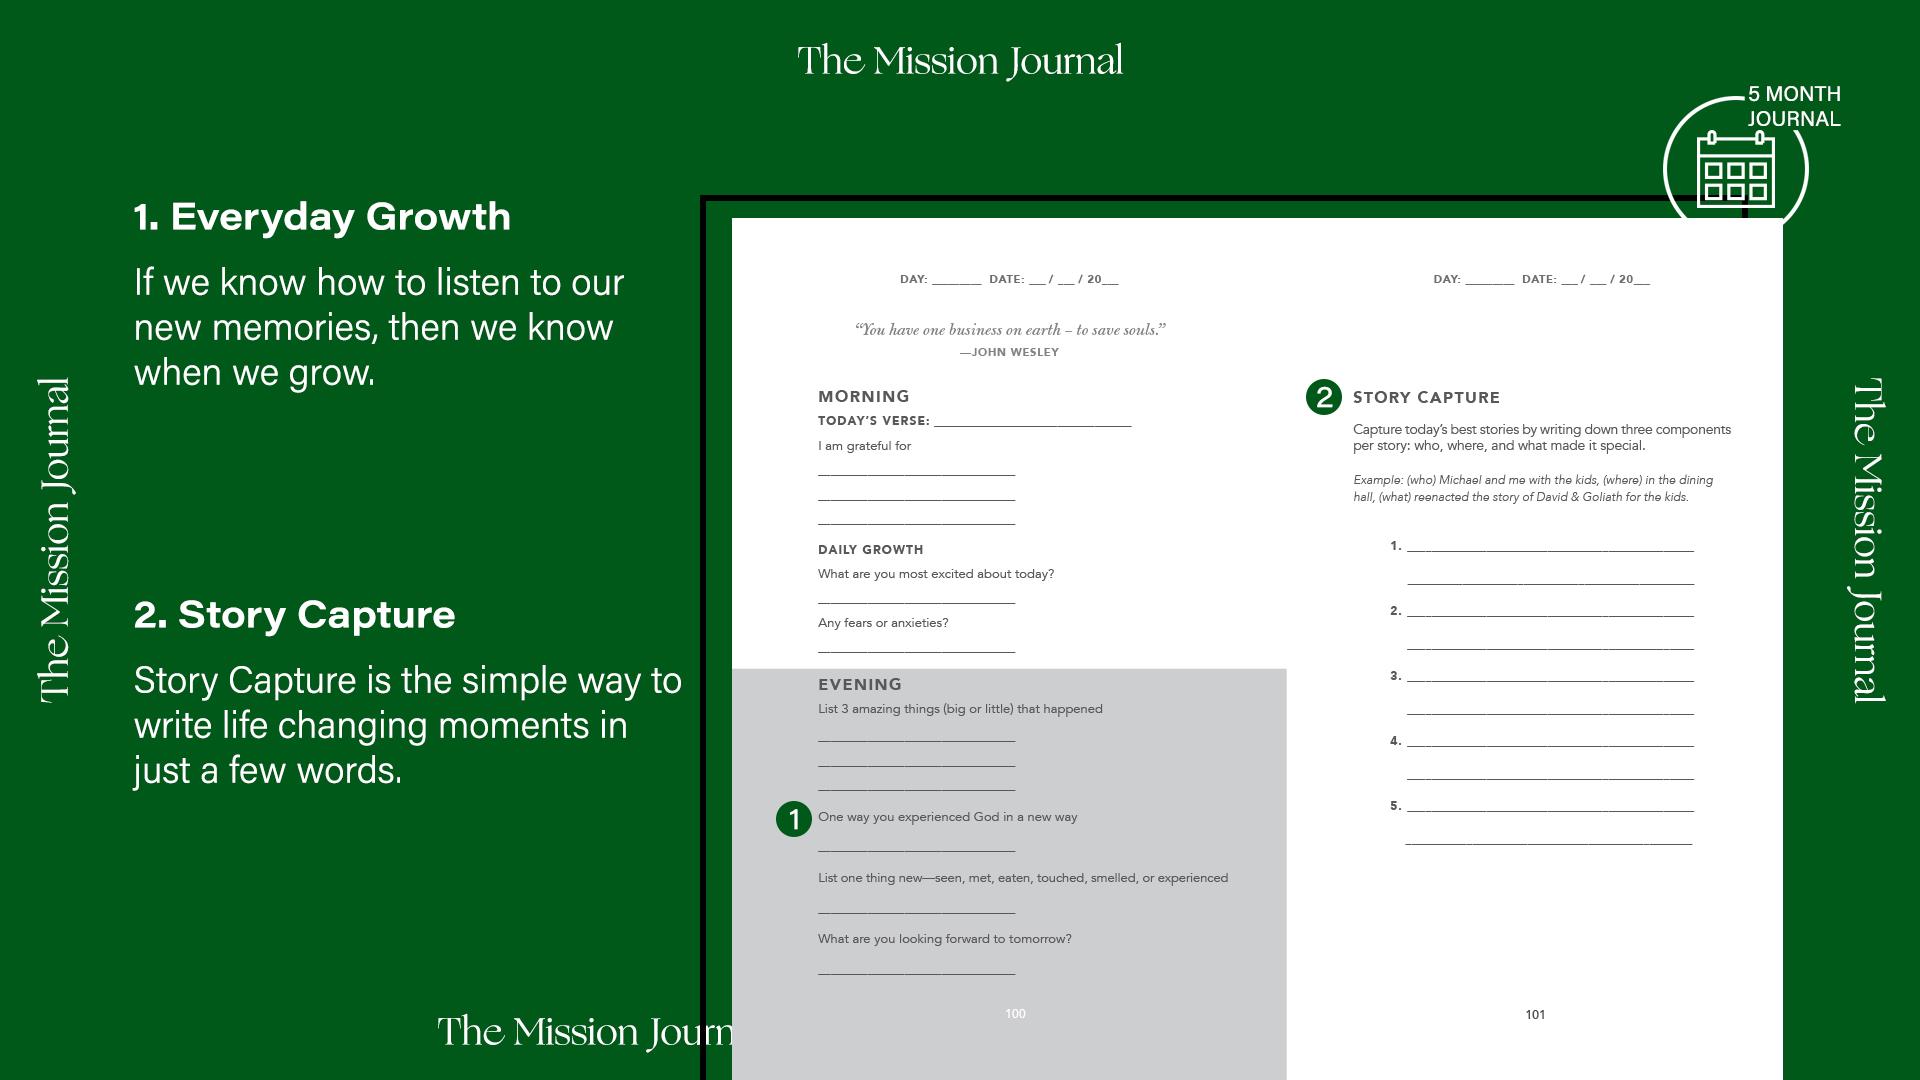 Mission Trip JournalShort Term Missionary Journal - 5 Months.jpg